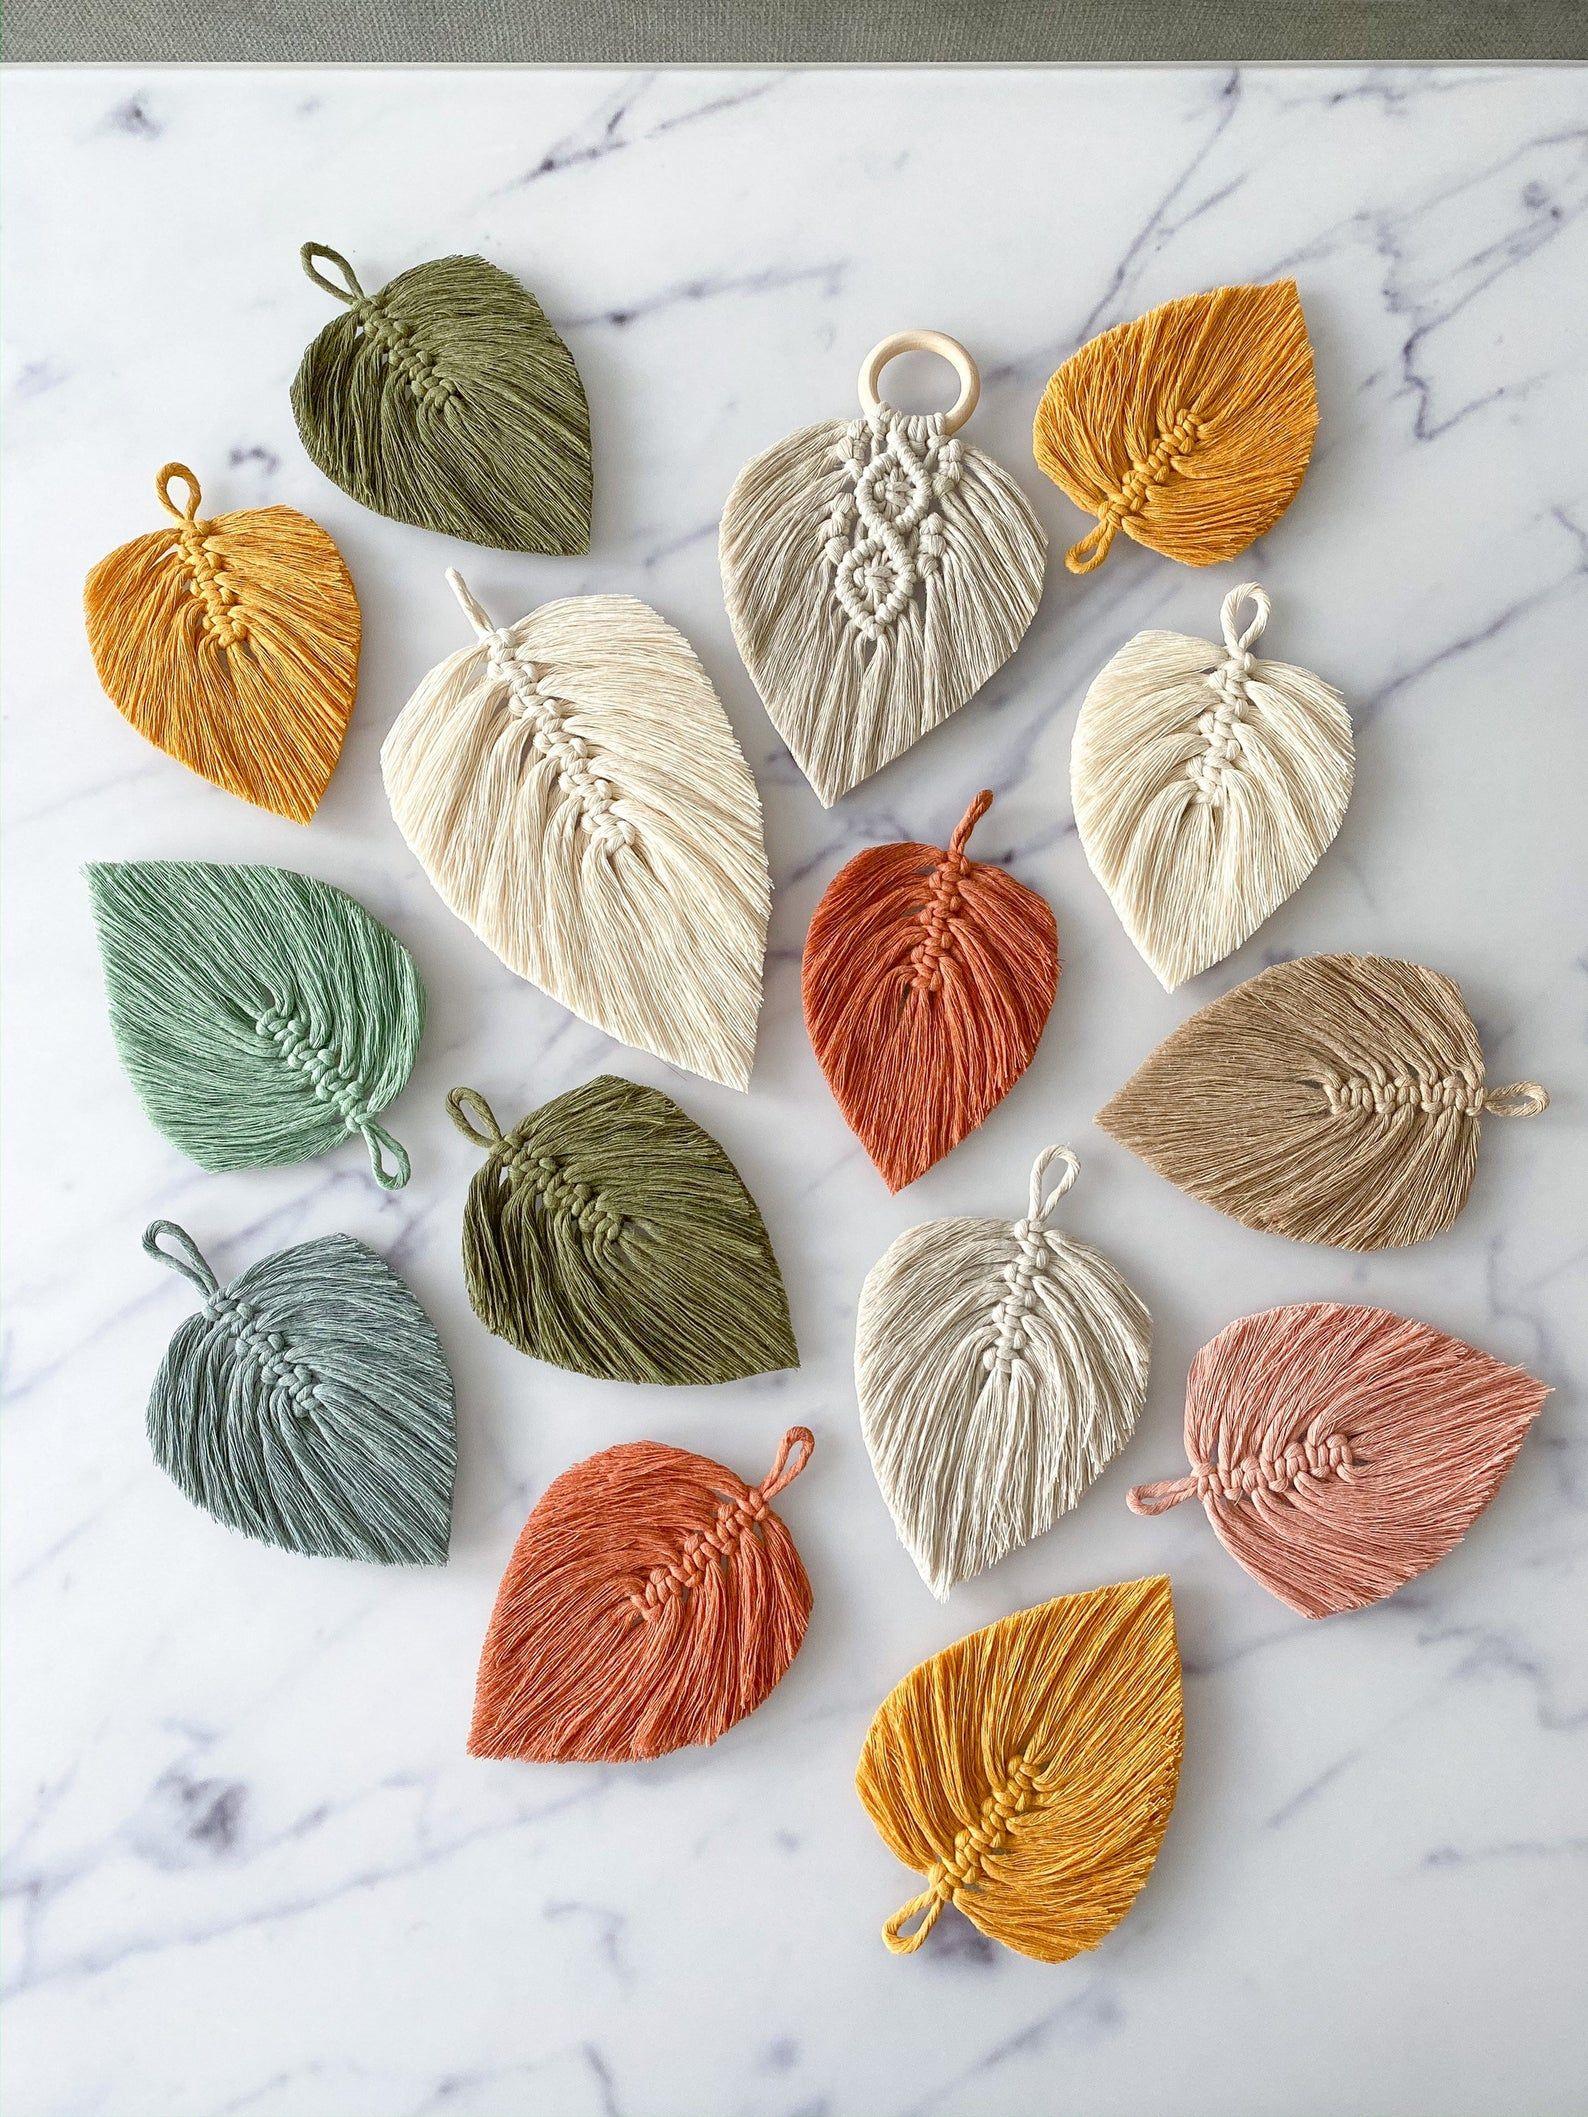 Makramee Feder Blatt - Macrame Feather Leaf Decoration